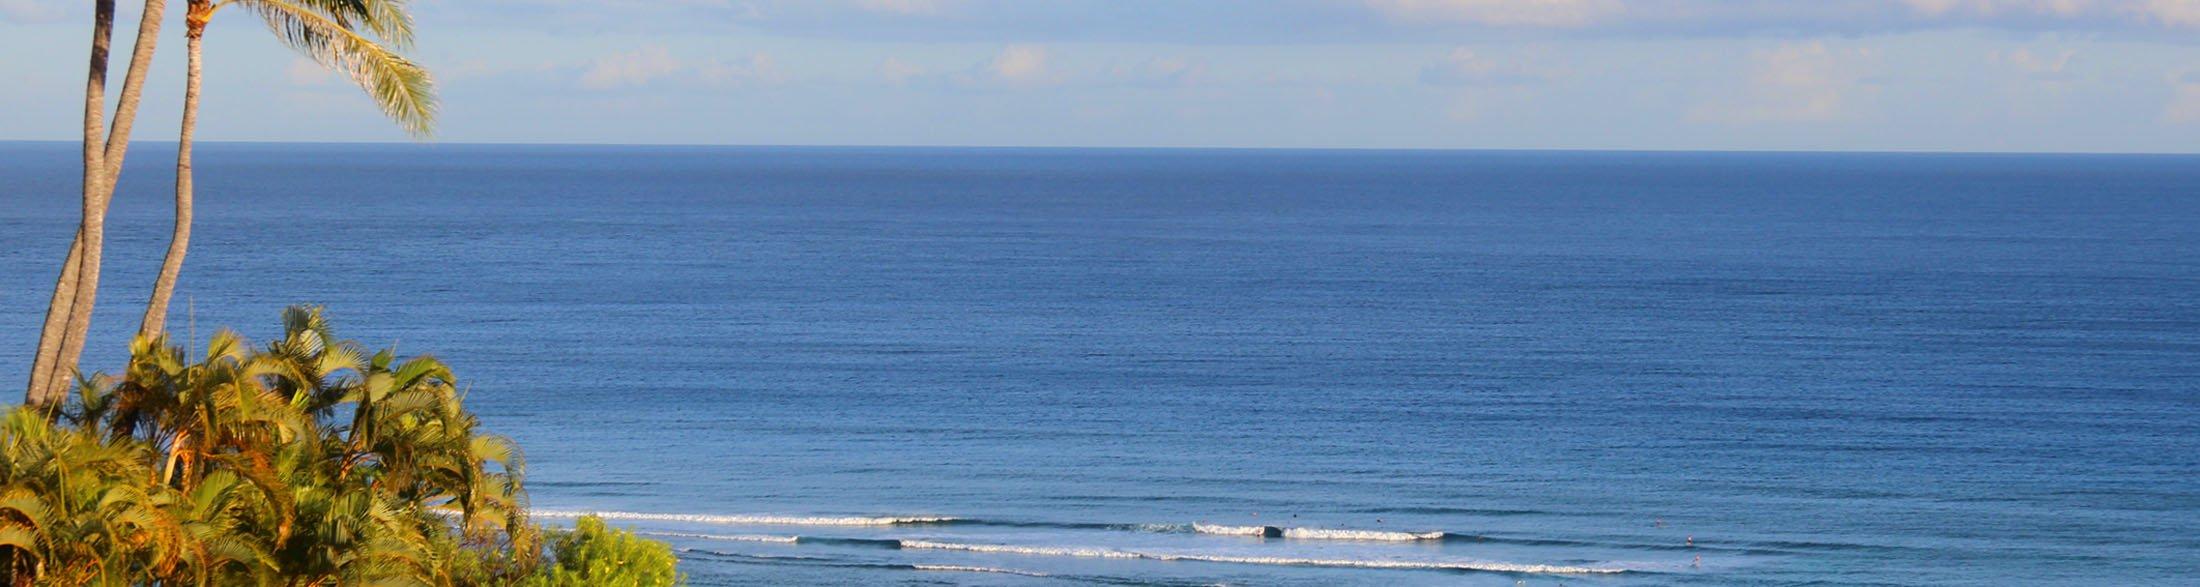 Oahu Ocean View Real Estate - Ocean View Homes for Sale